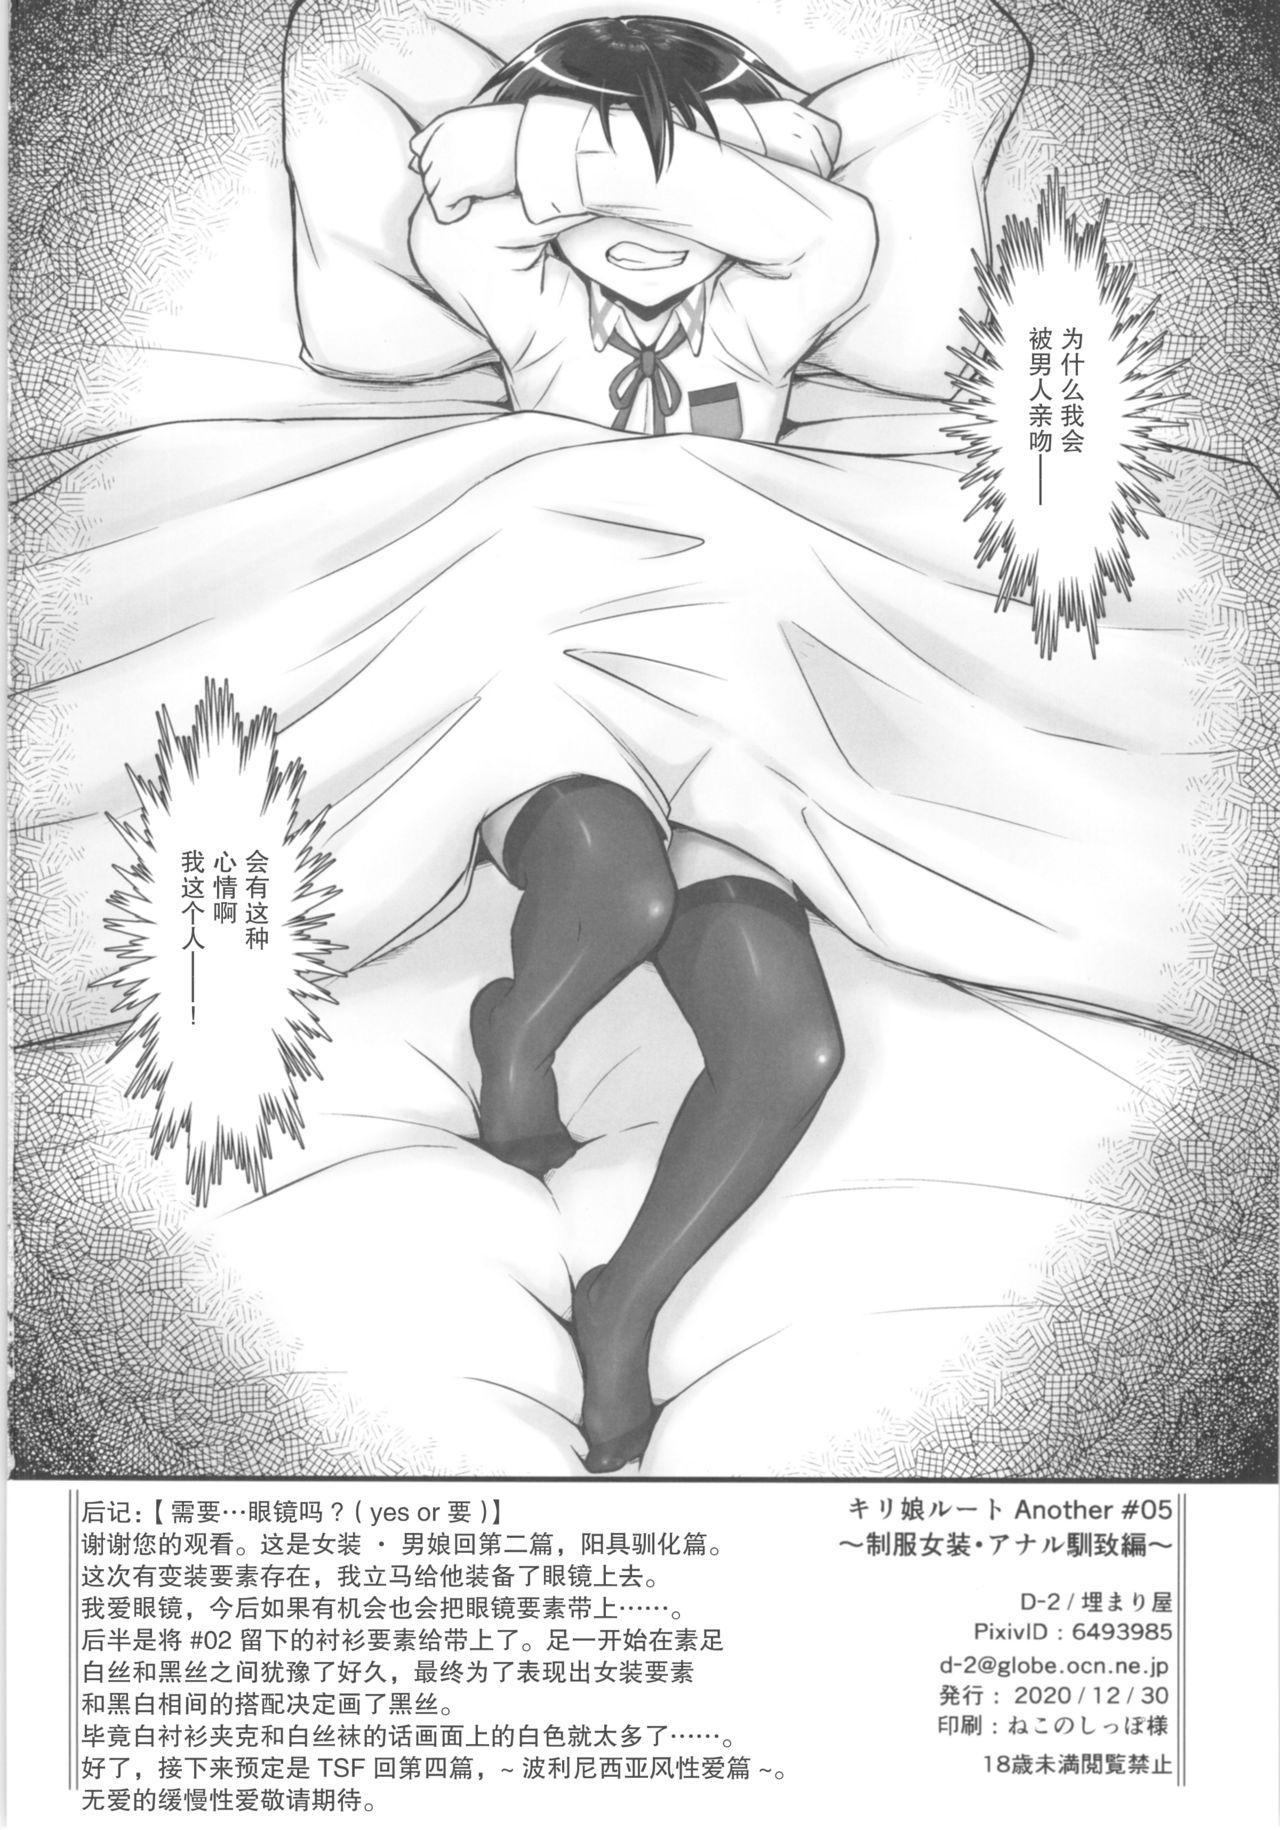 [Umari-ya (D-2)] Kiriko Route Another #05 ~Seifuku Josou Anal Junchi Hen~ (Sword Art Online) ) [Chinese] [不可视汉化] 41